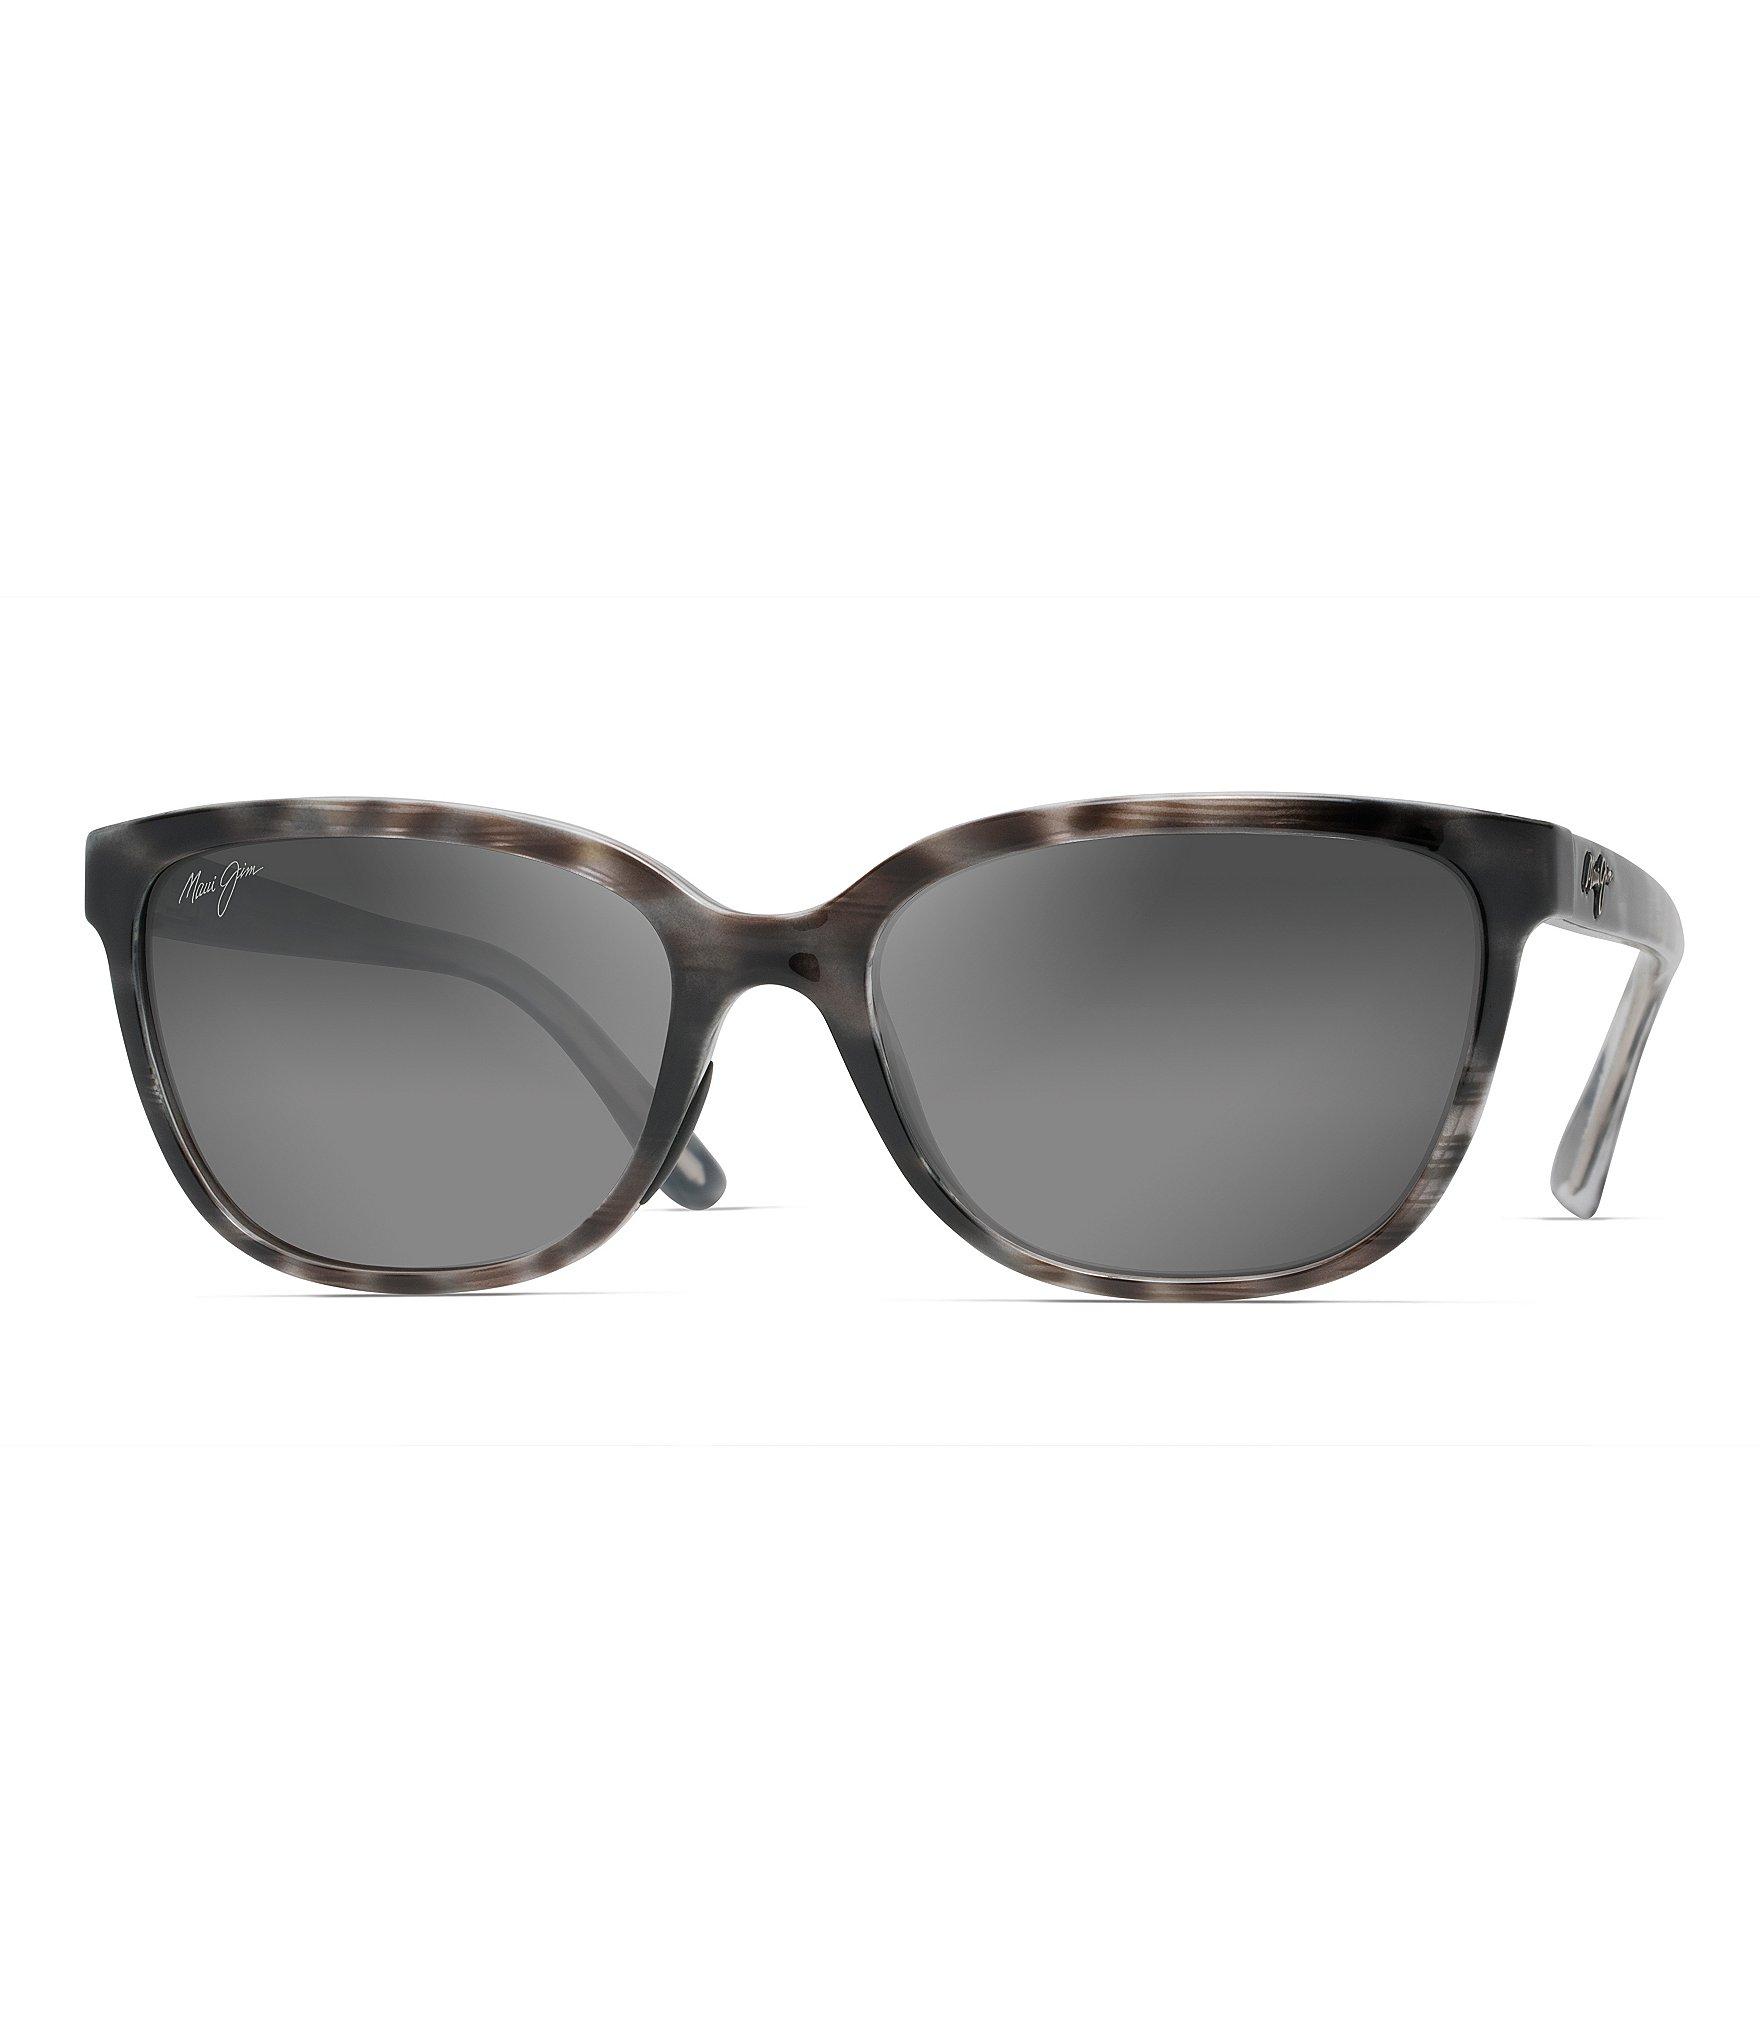 c706bfdb3317 Maui Jim Honi Colorblocked Polarized Cat Eye Sunglasses | Dillard's